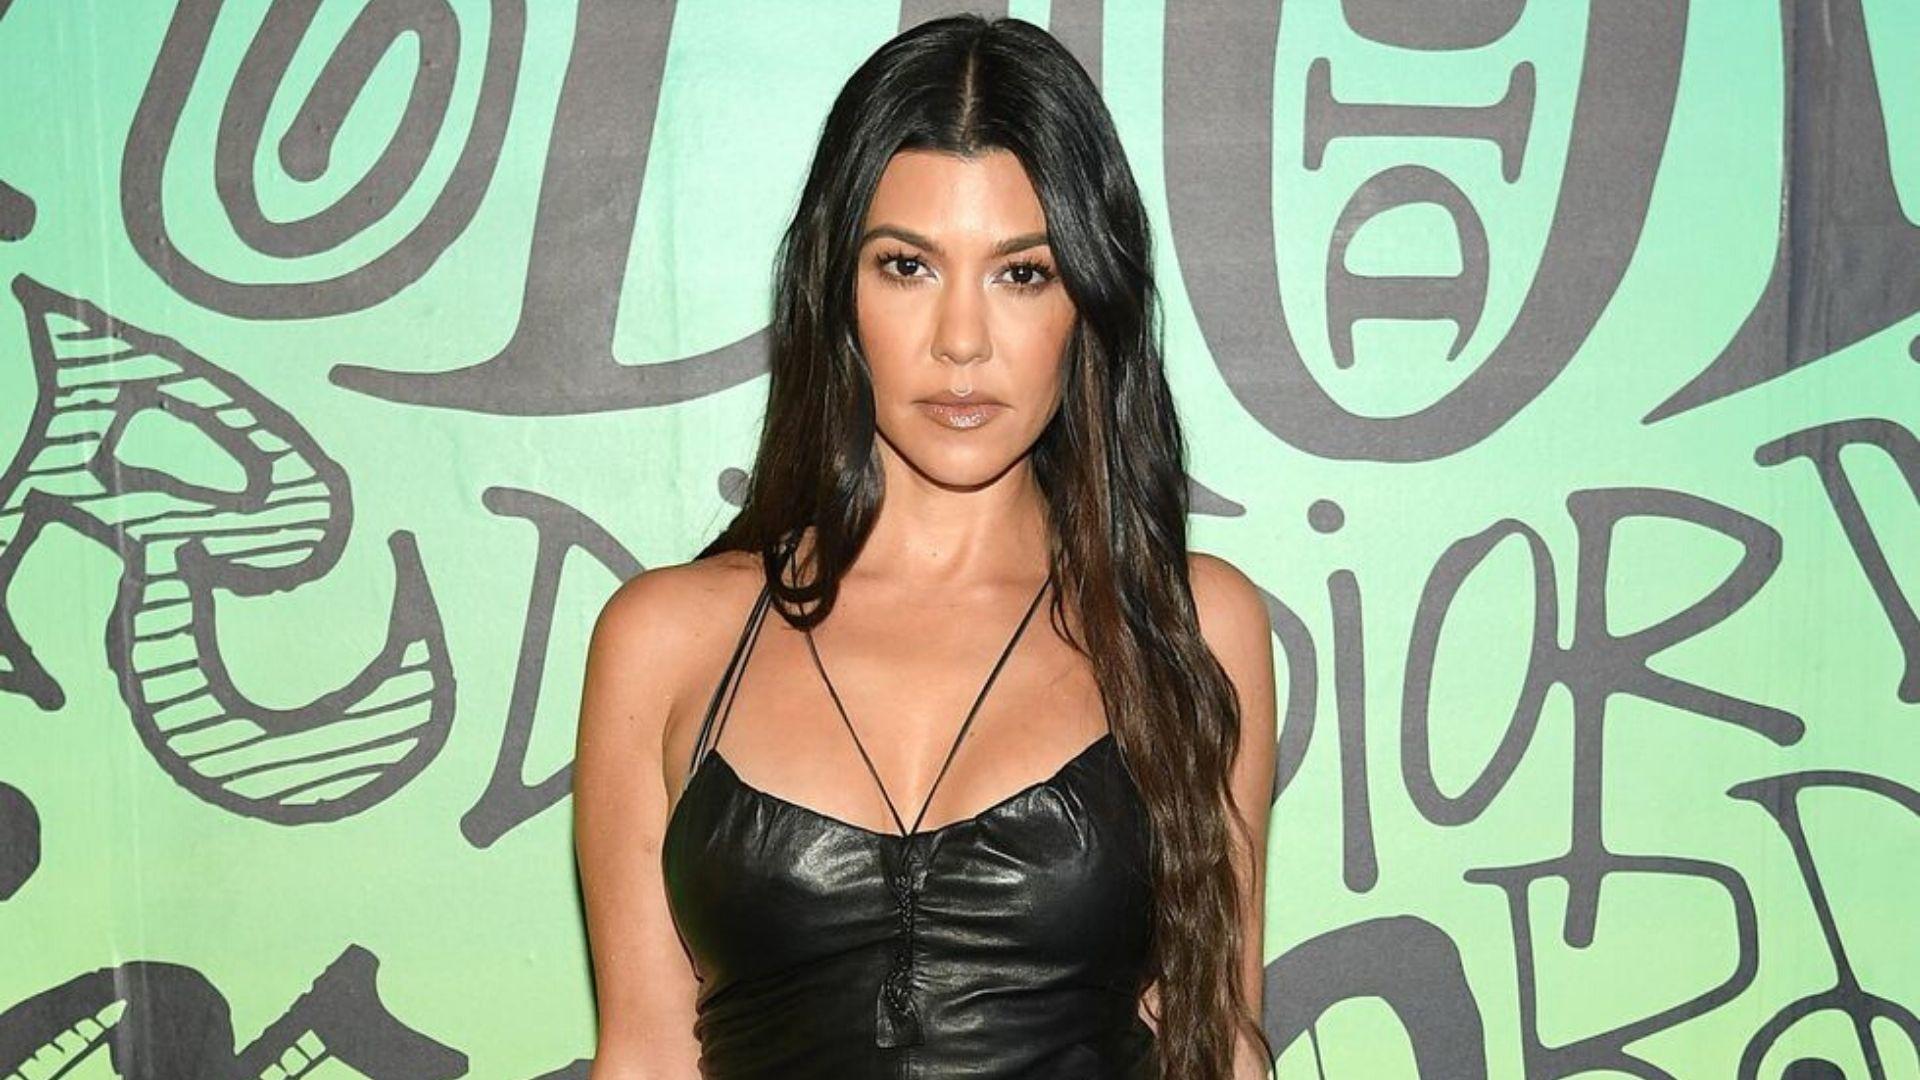 Kourtney Kardashian Responds To Backlash Over The Christmas Present She Bought For Her Kids